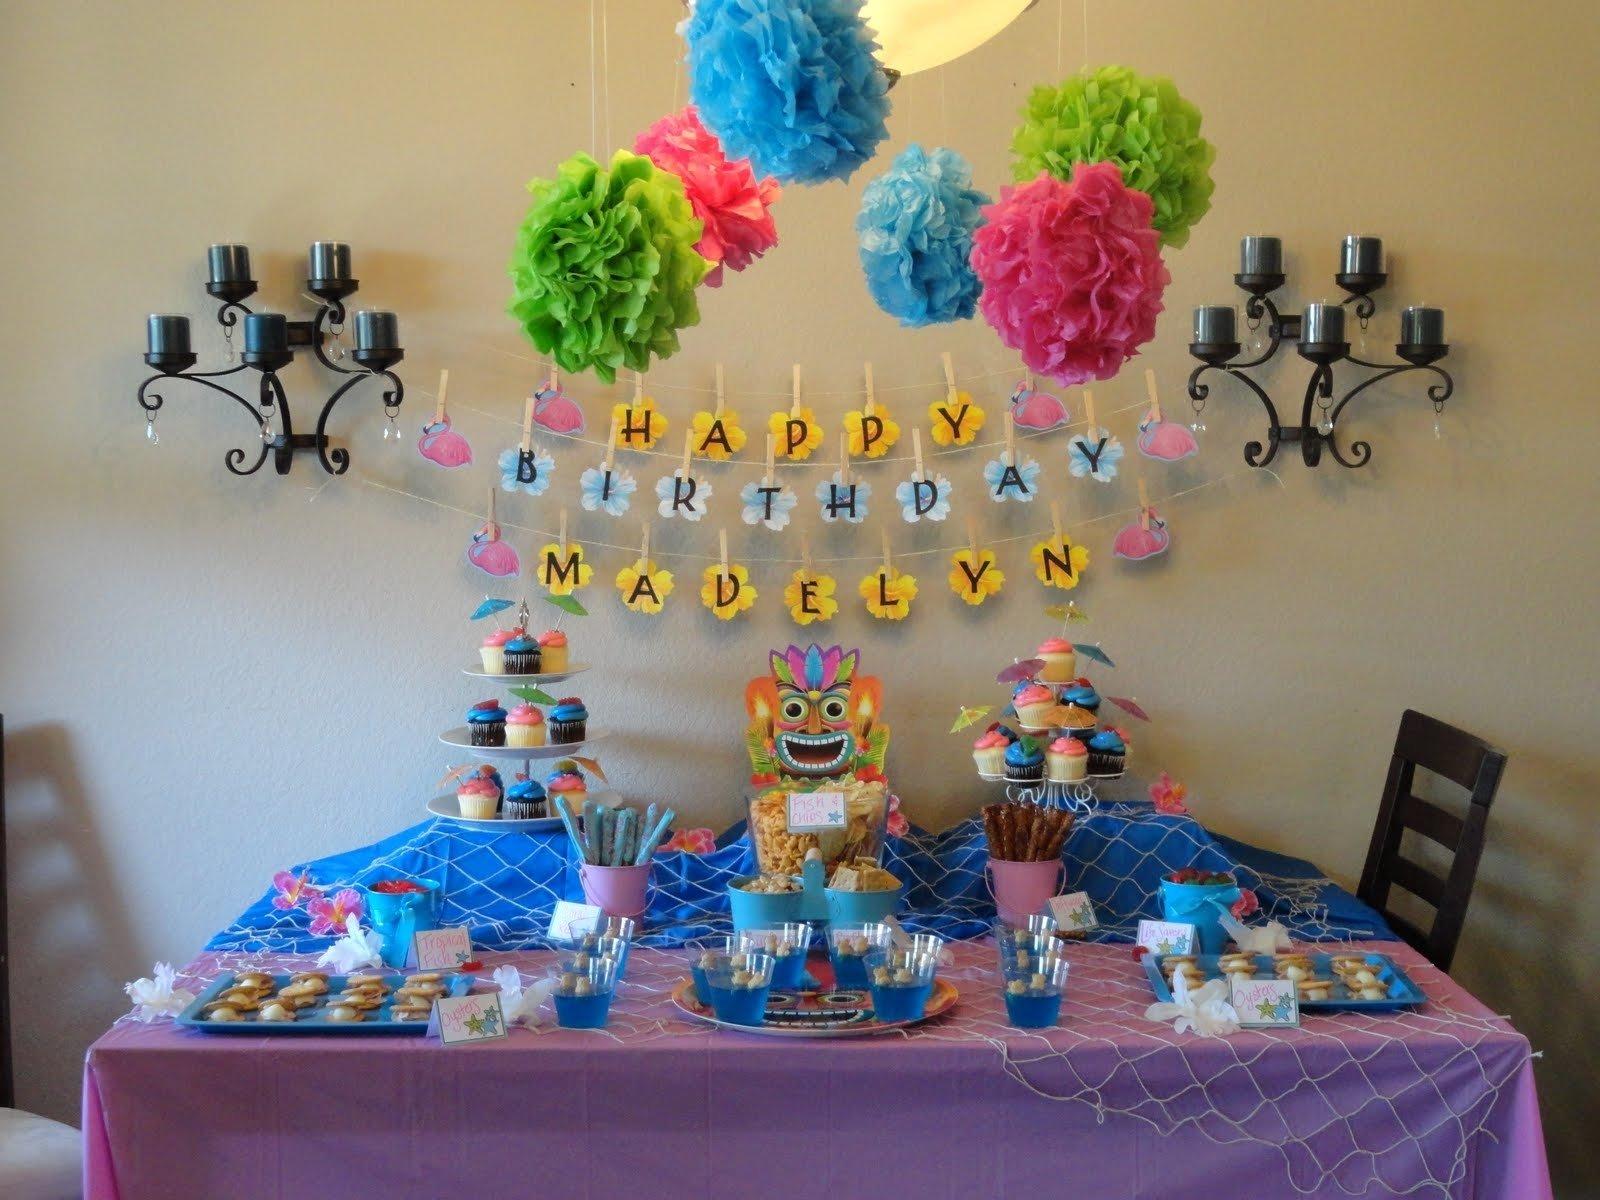 10 Trendy 4 Year Old Birthday Ideas themes birthday 2 and 4 year old birthday party ideas as well as 12 2020